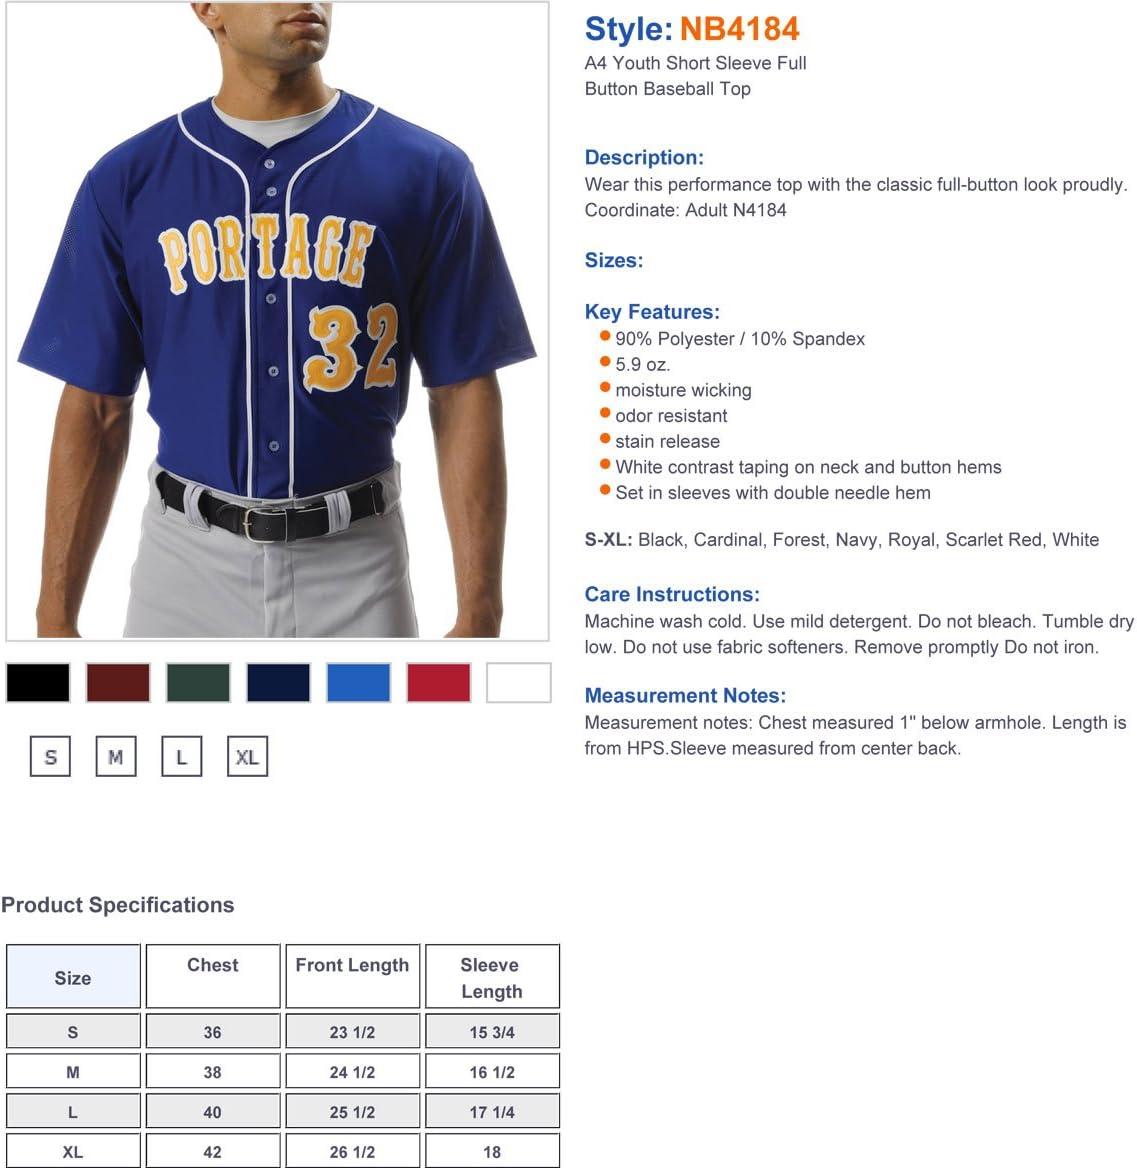 A4 NB4184 Youth Short Sleeve Full Button Baseball Top